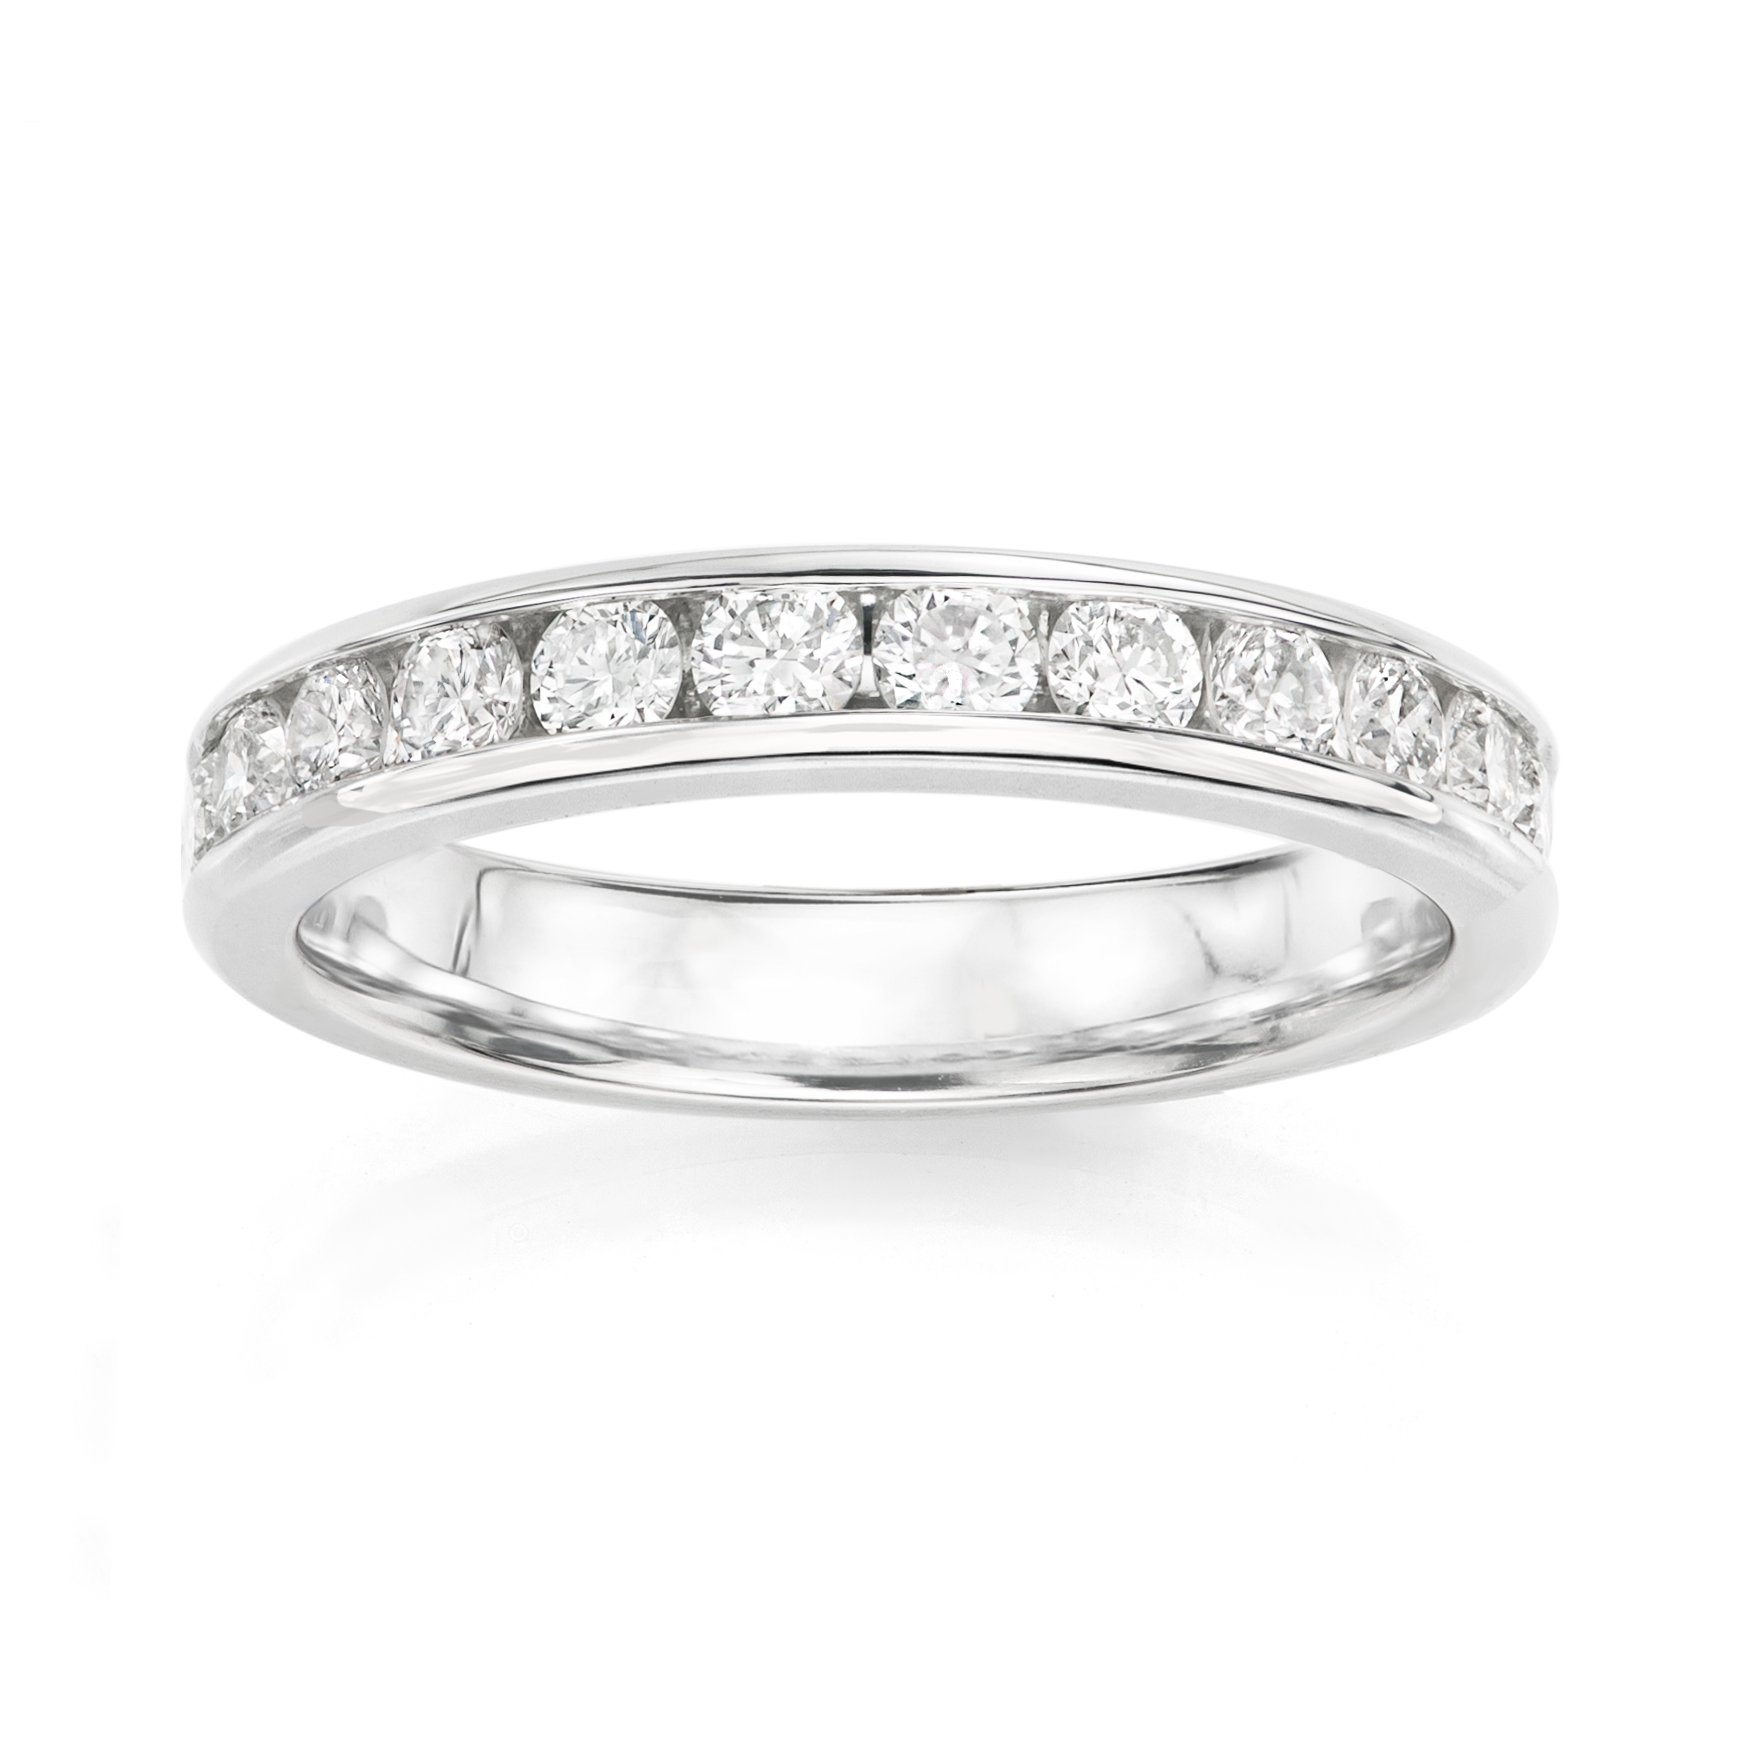 14KT White Gold 0.5ct G-I SI1/SI2 Channel Machine Set Wedding Ring